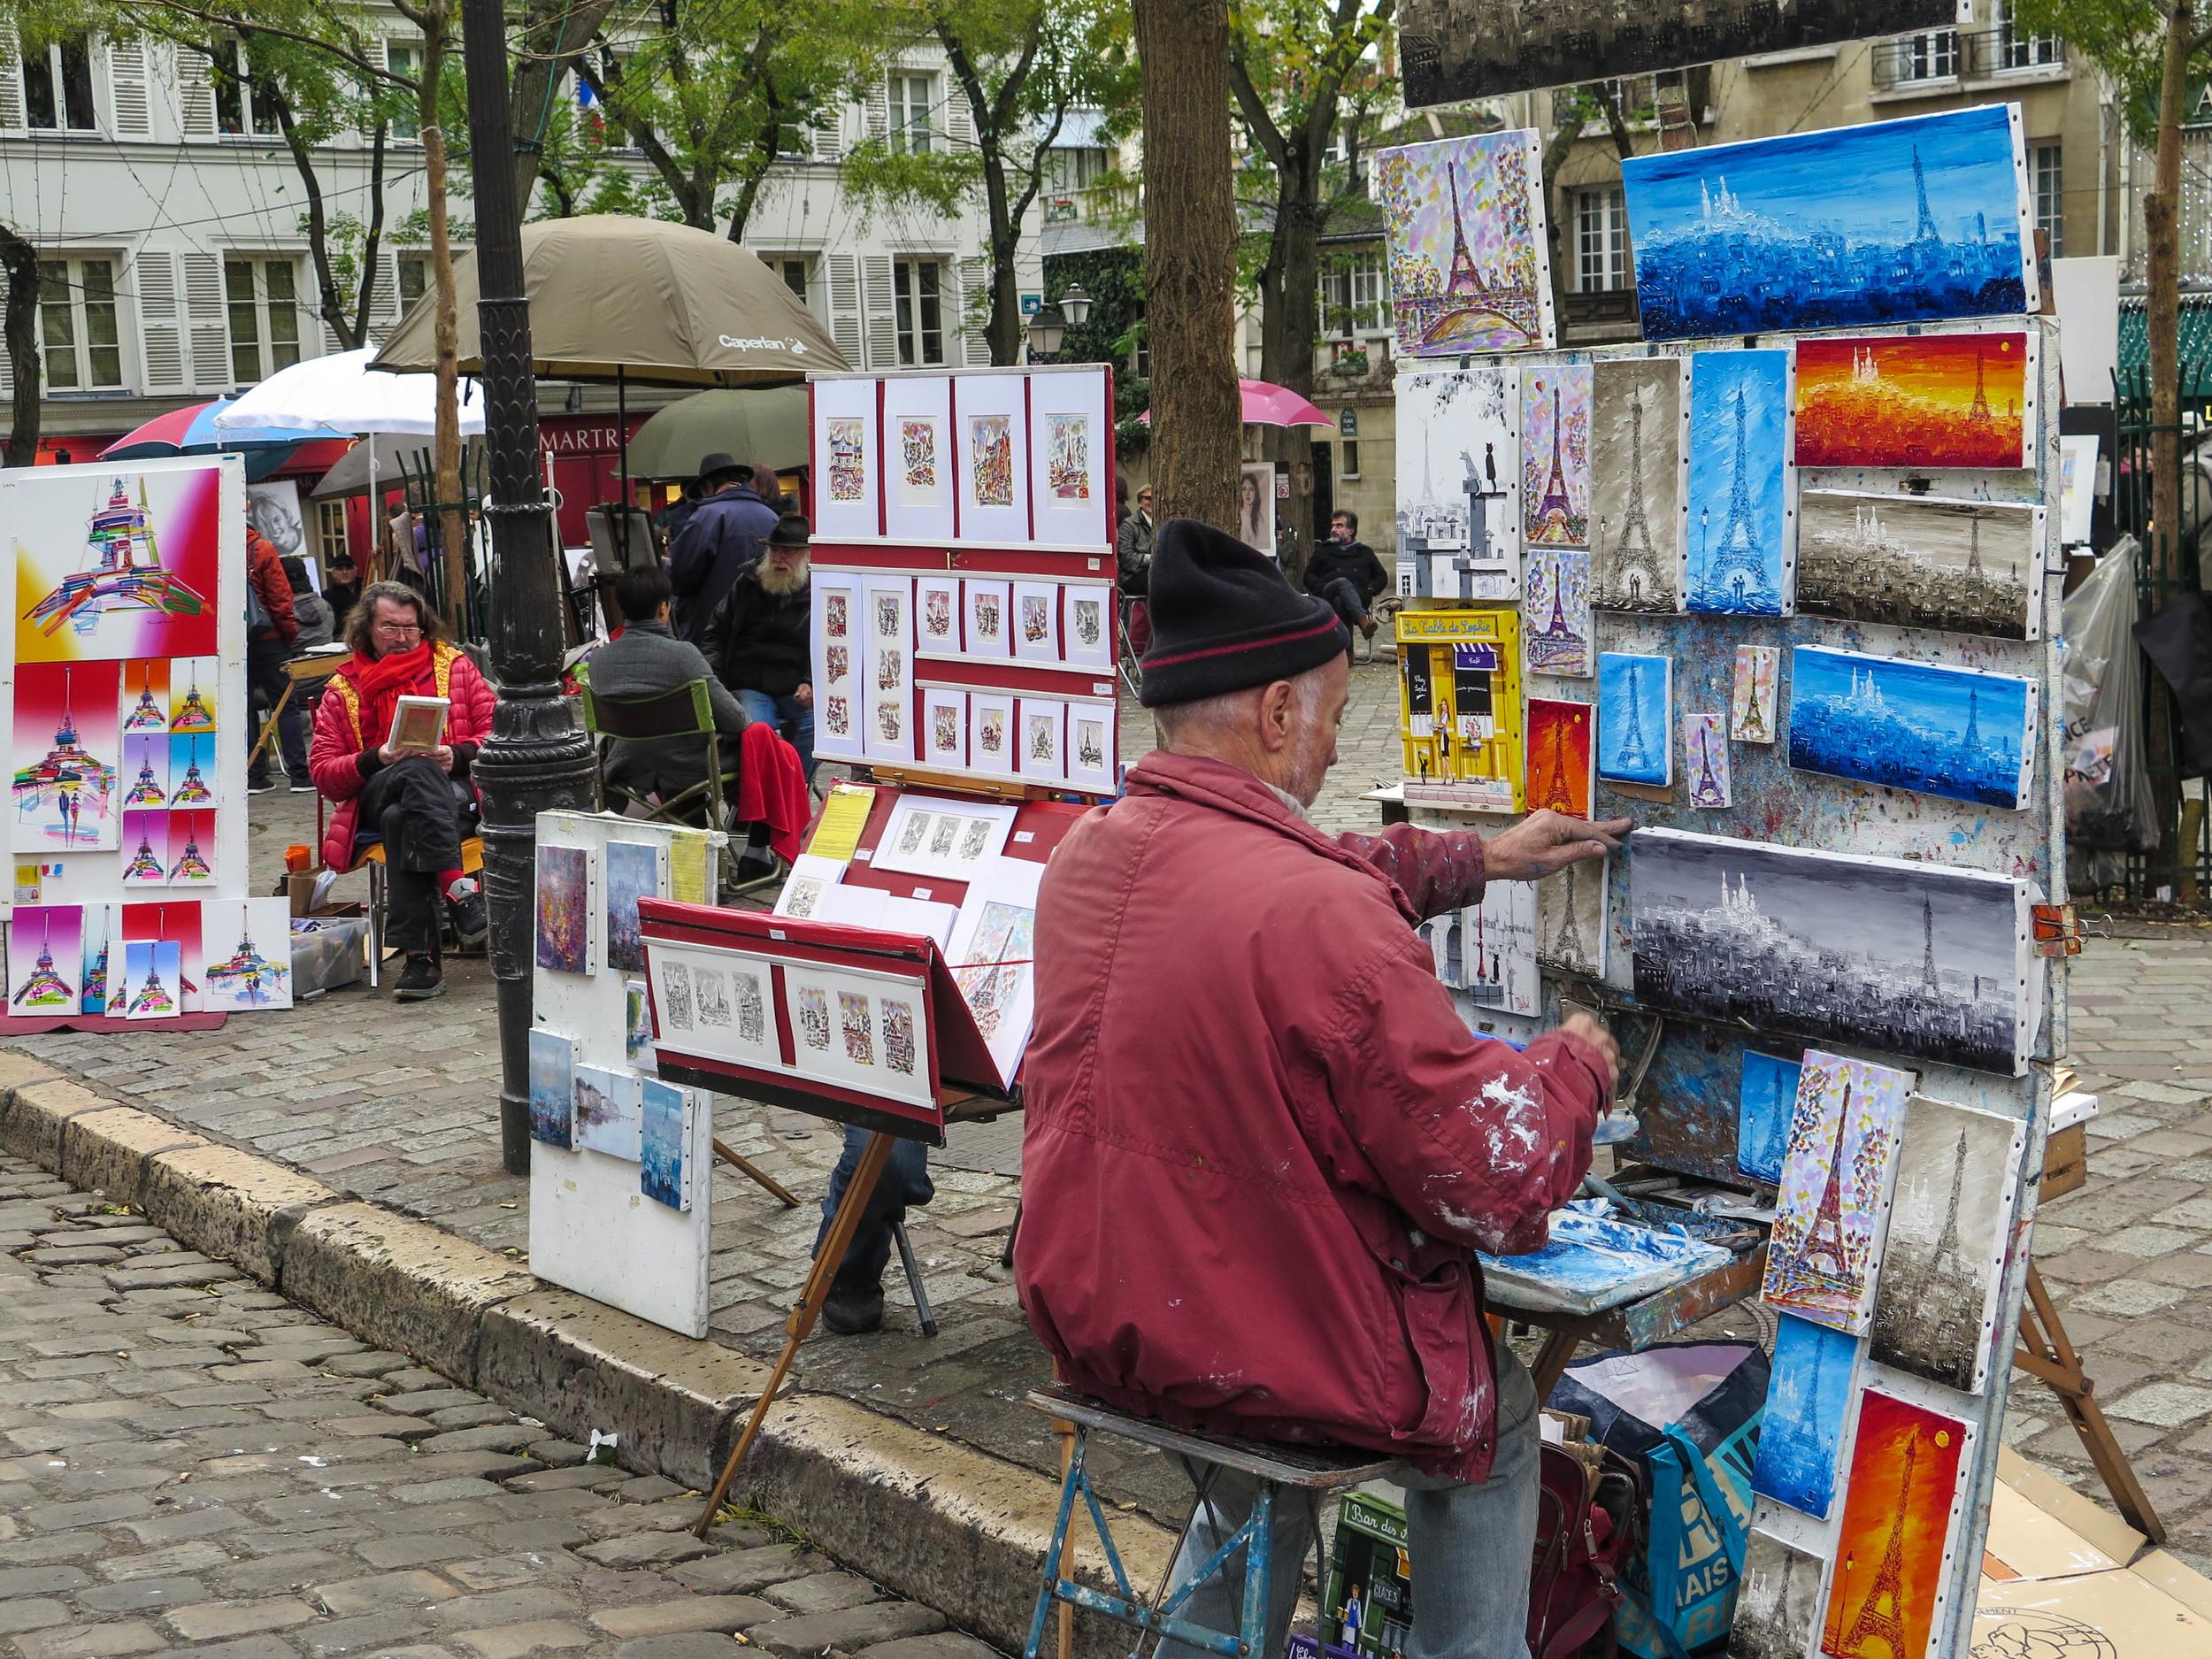 Paris_guide-7.jpg